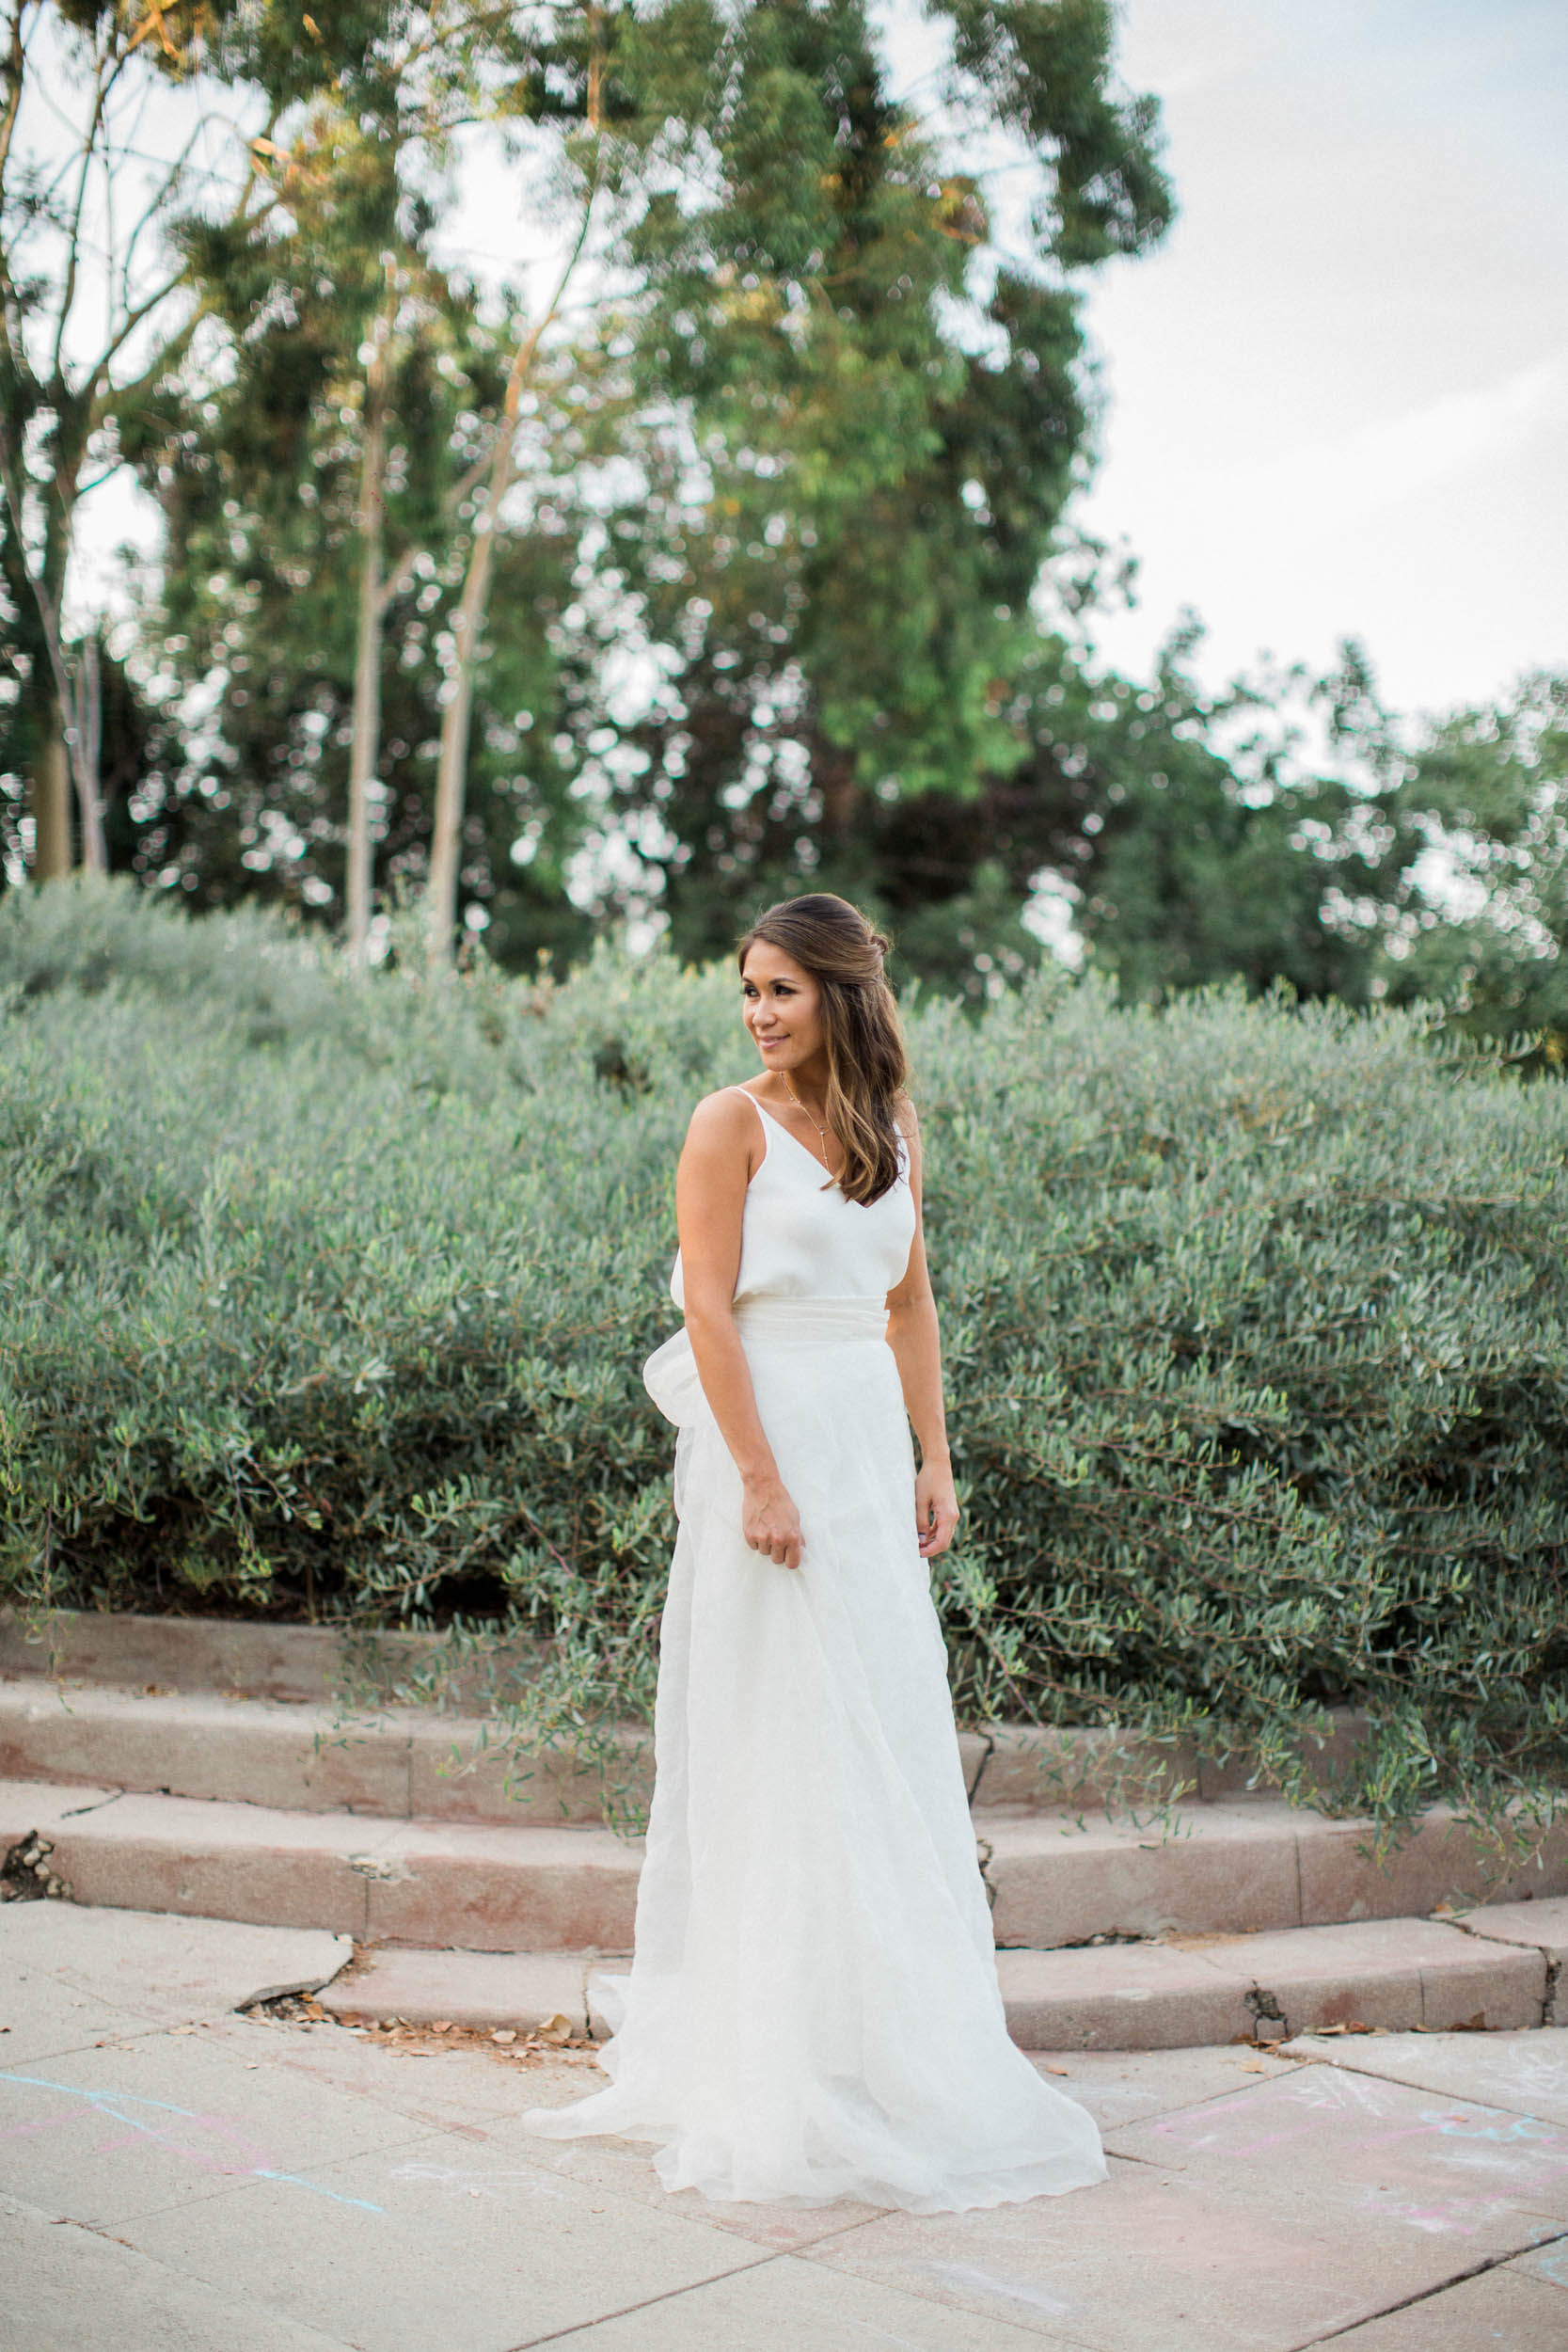 BKM-Photography-Highland-Park-Los-Angeles-Backyard-Wedding-0046.jpg